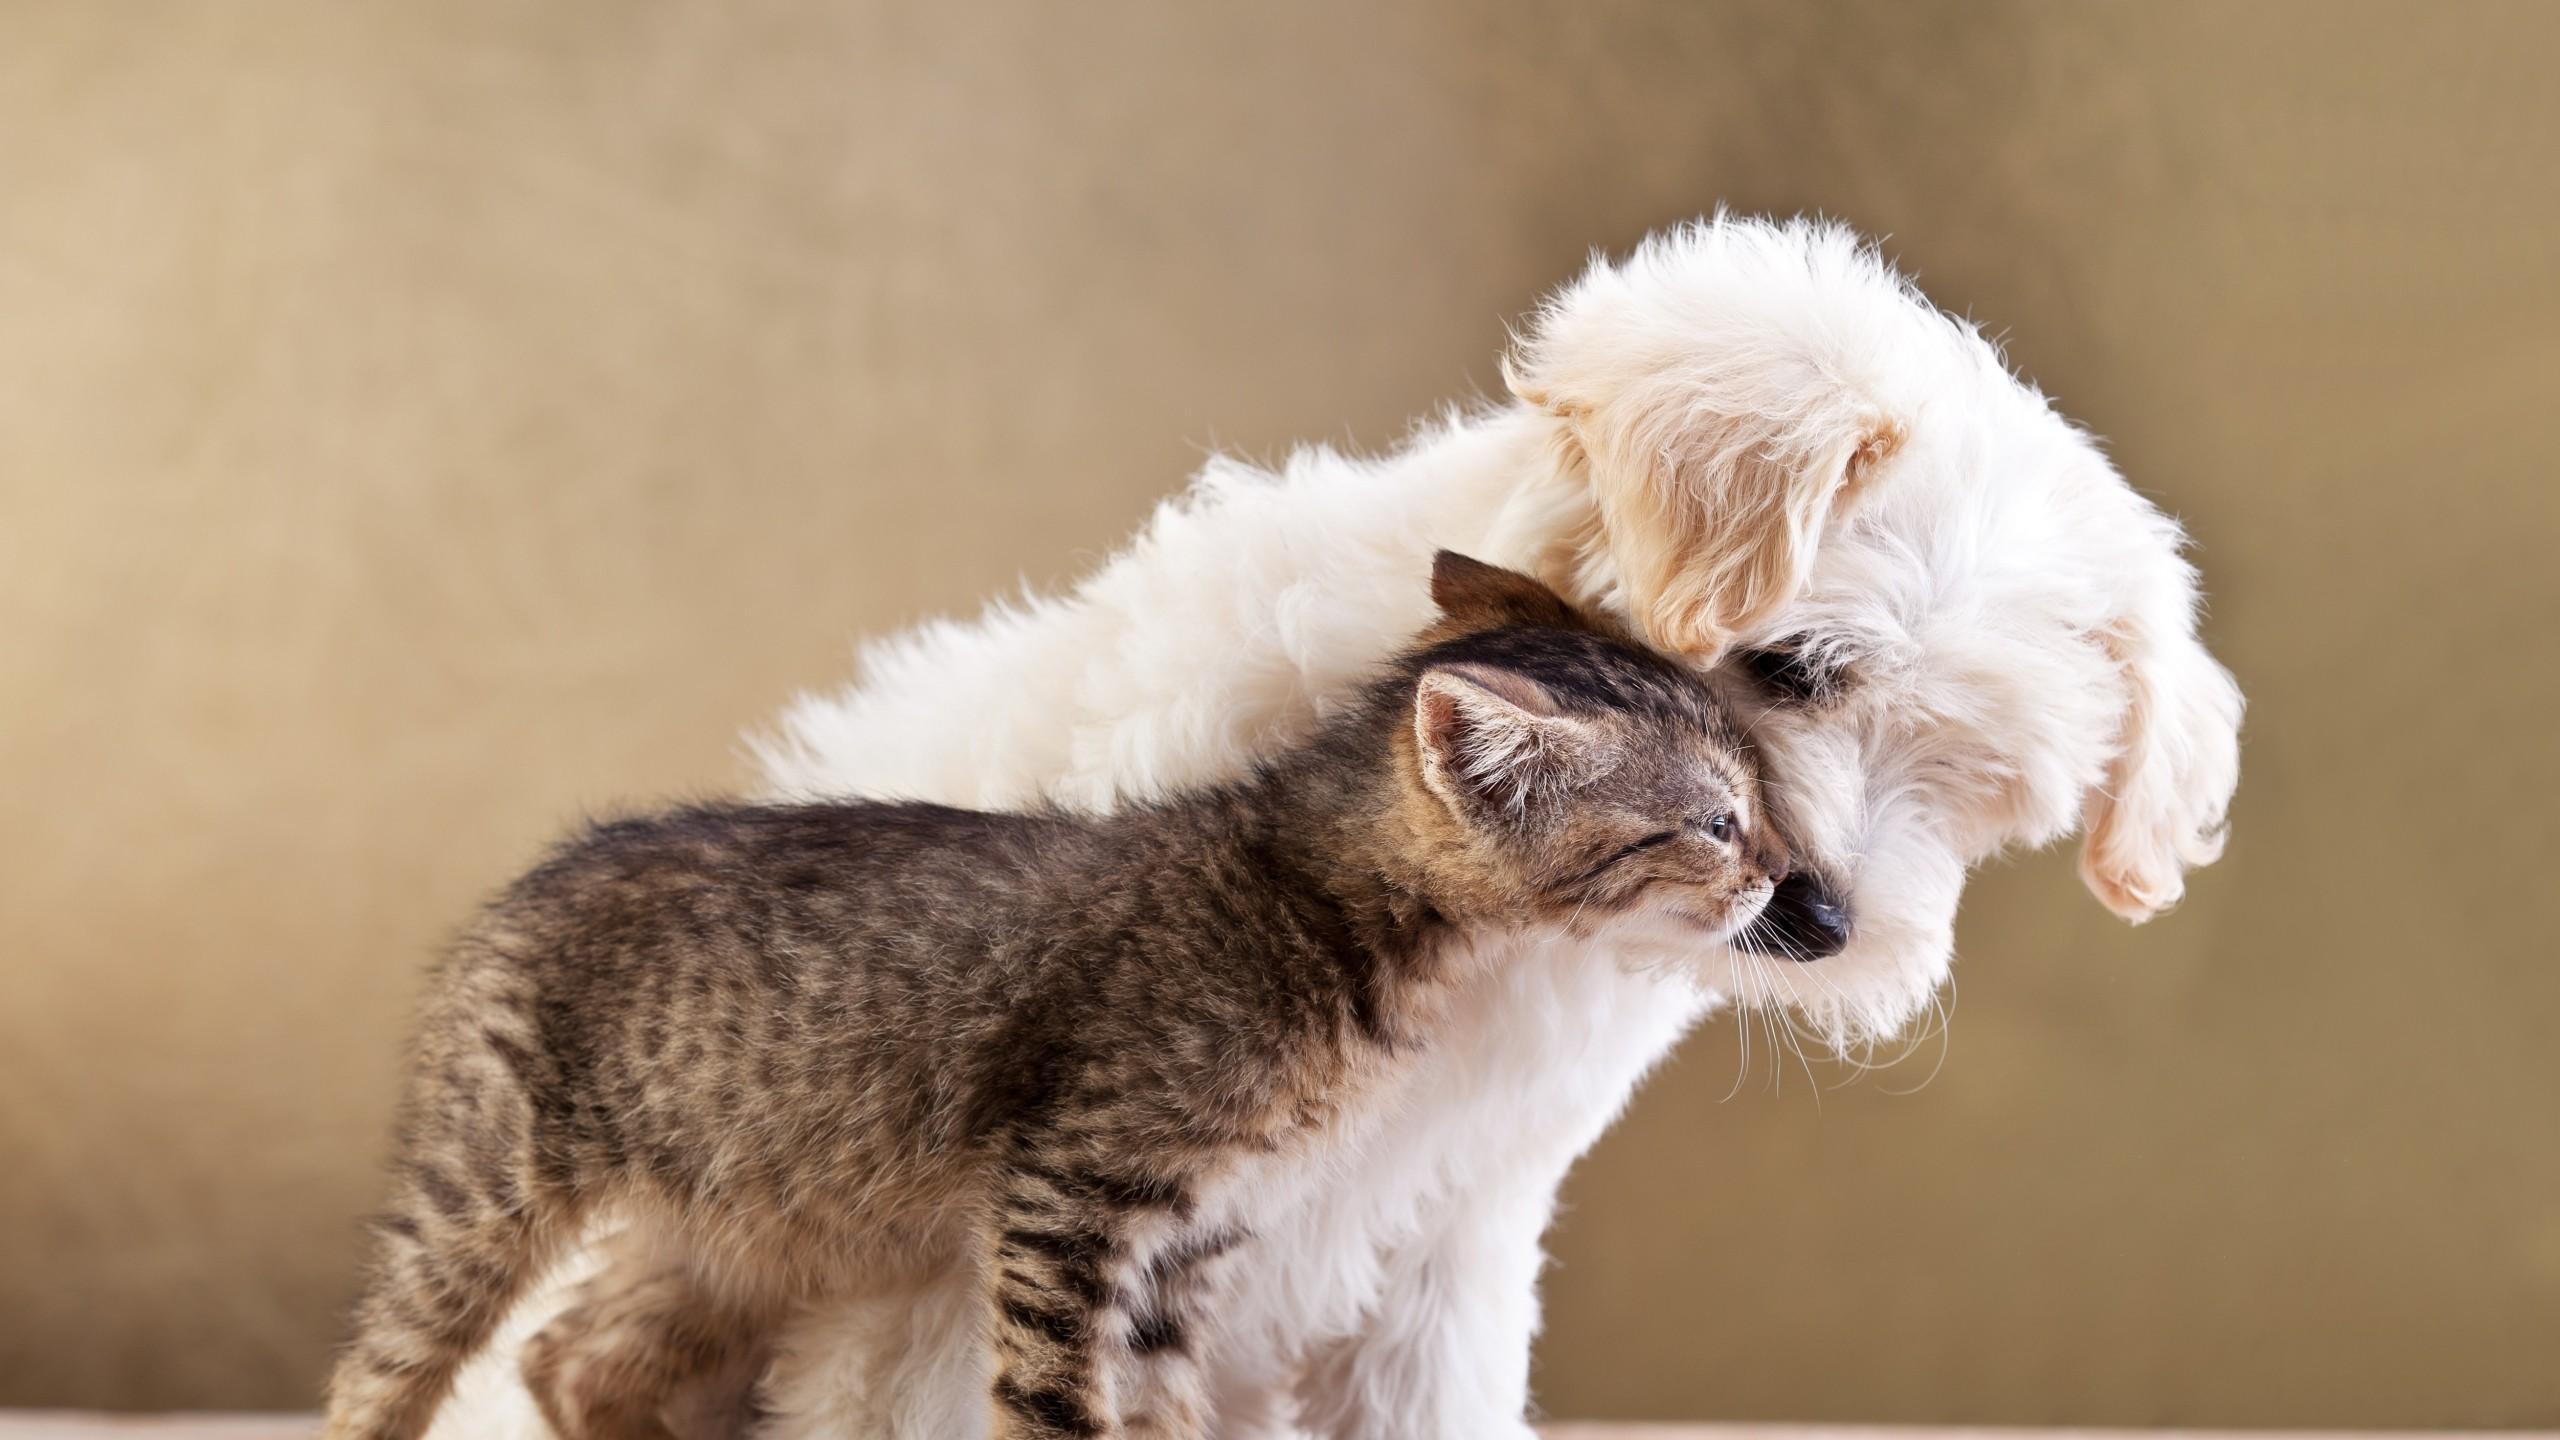 Preview wallpaper puppy, kitten, friends, animals, caring, tenderness  2560×1440